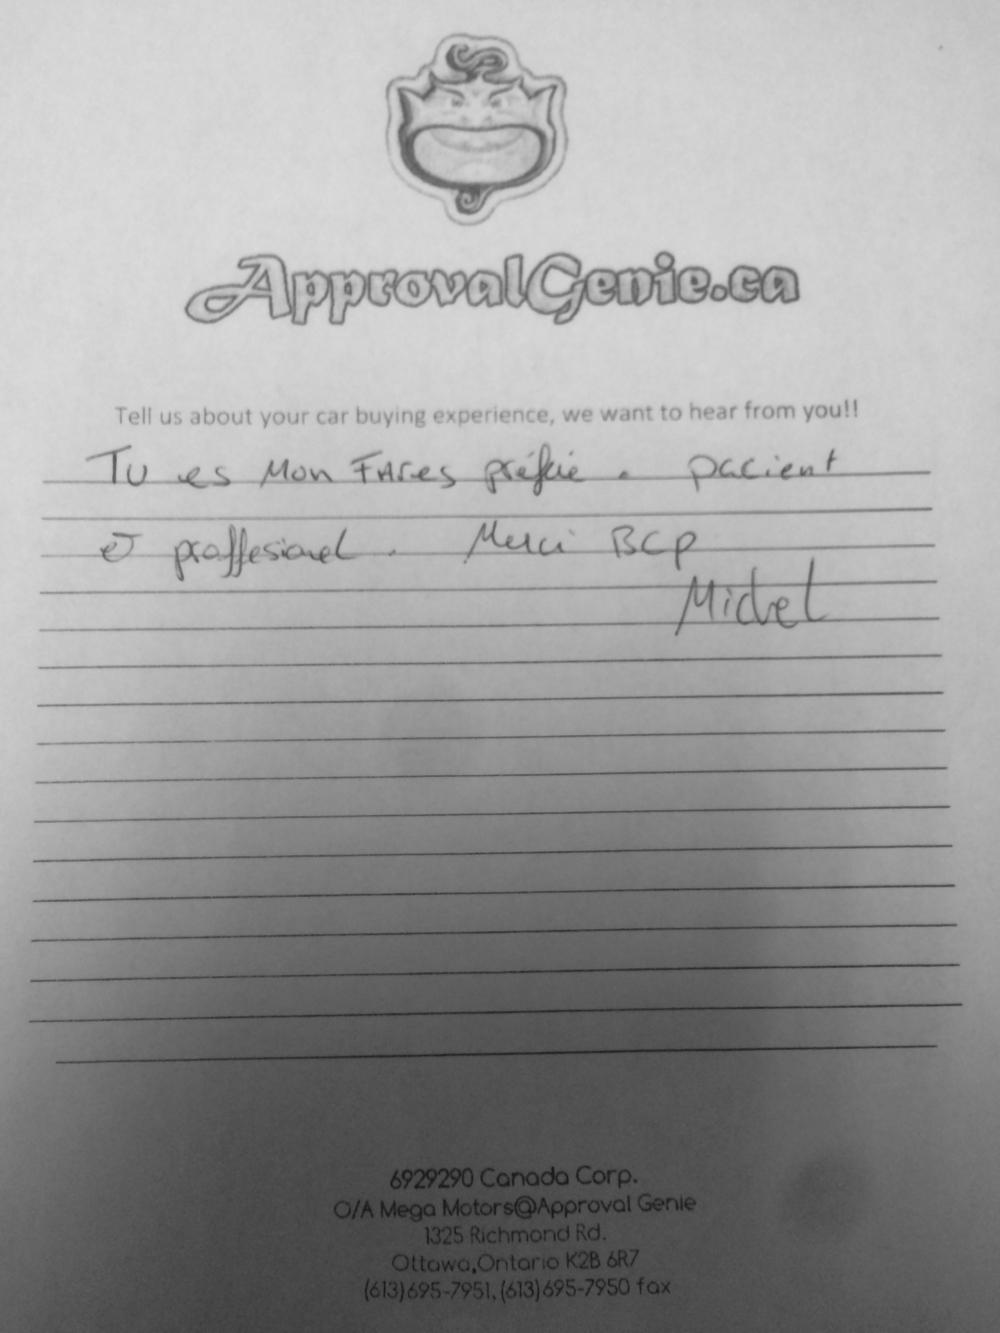 YUNIA ALMAGUER FUENTE_Testimonial.jpg